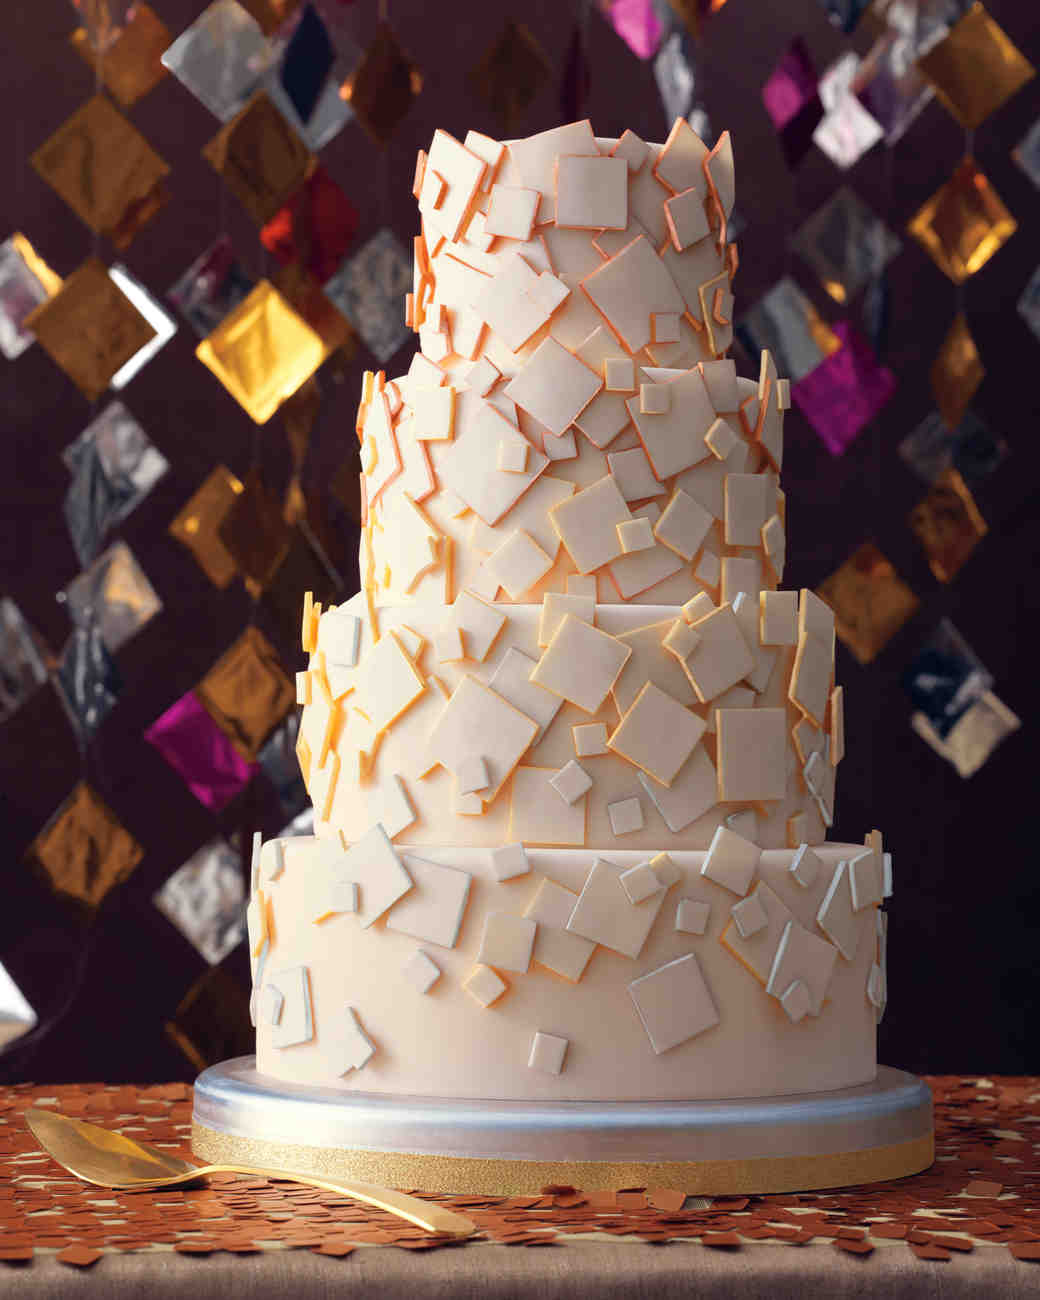 cake-mwd109235.jpg